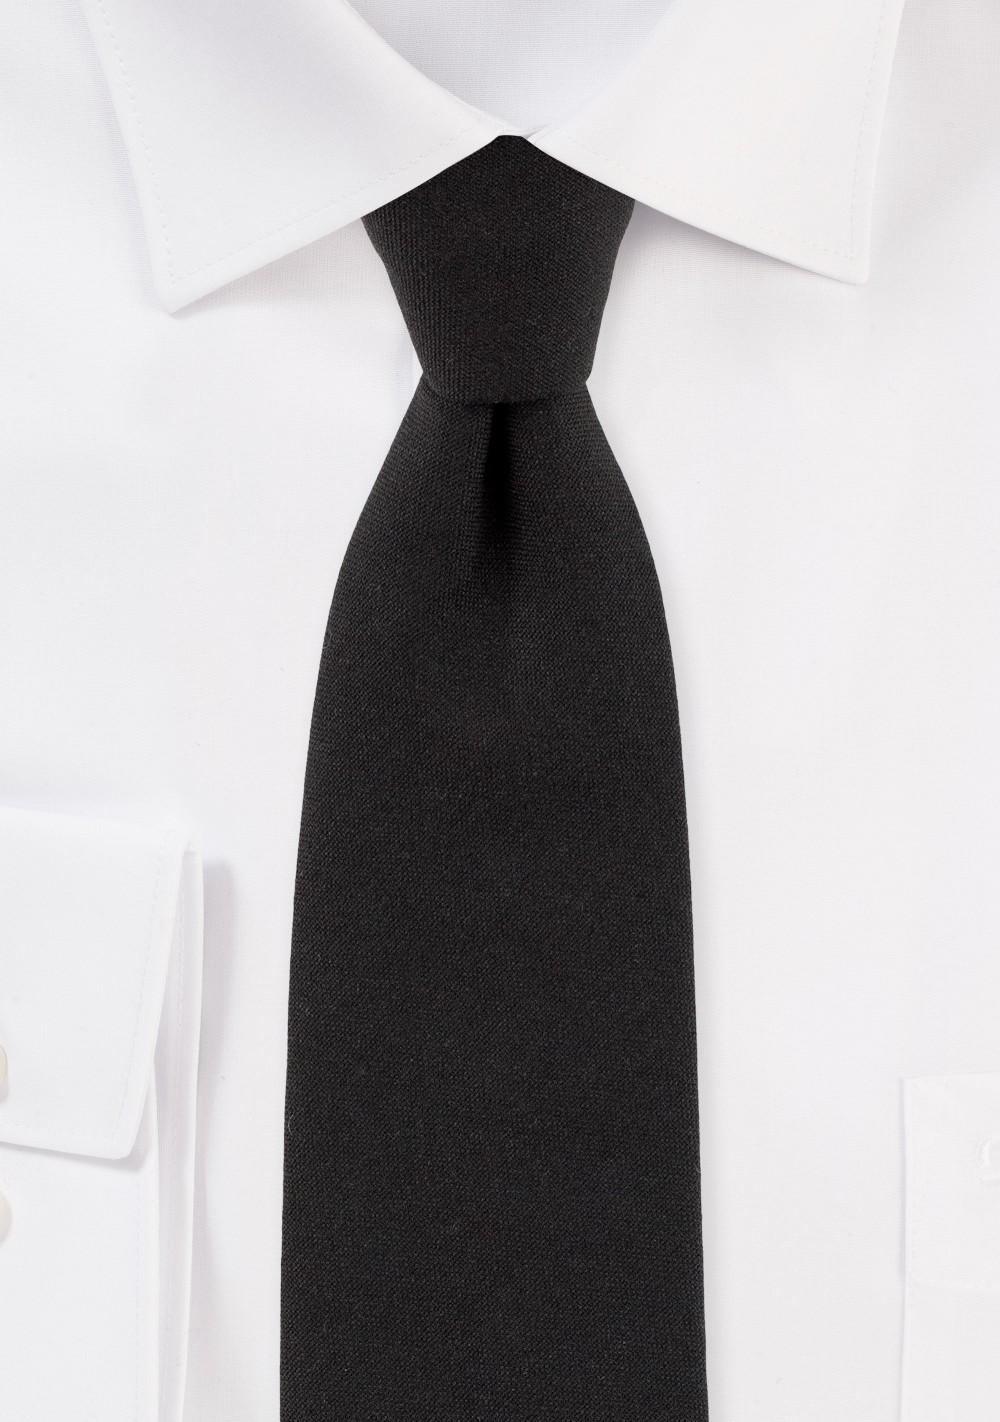 Matte Black Slim Cut Mens Tie in Cotton